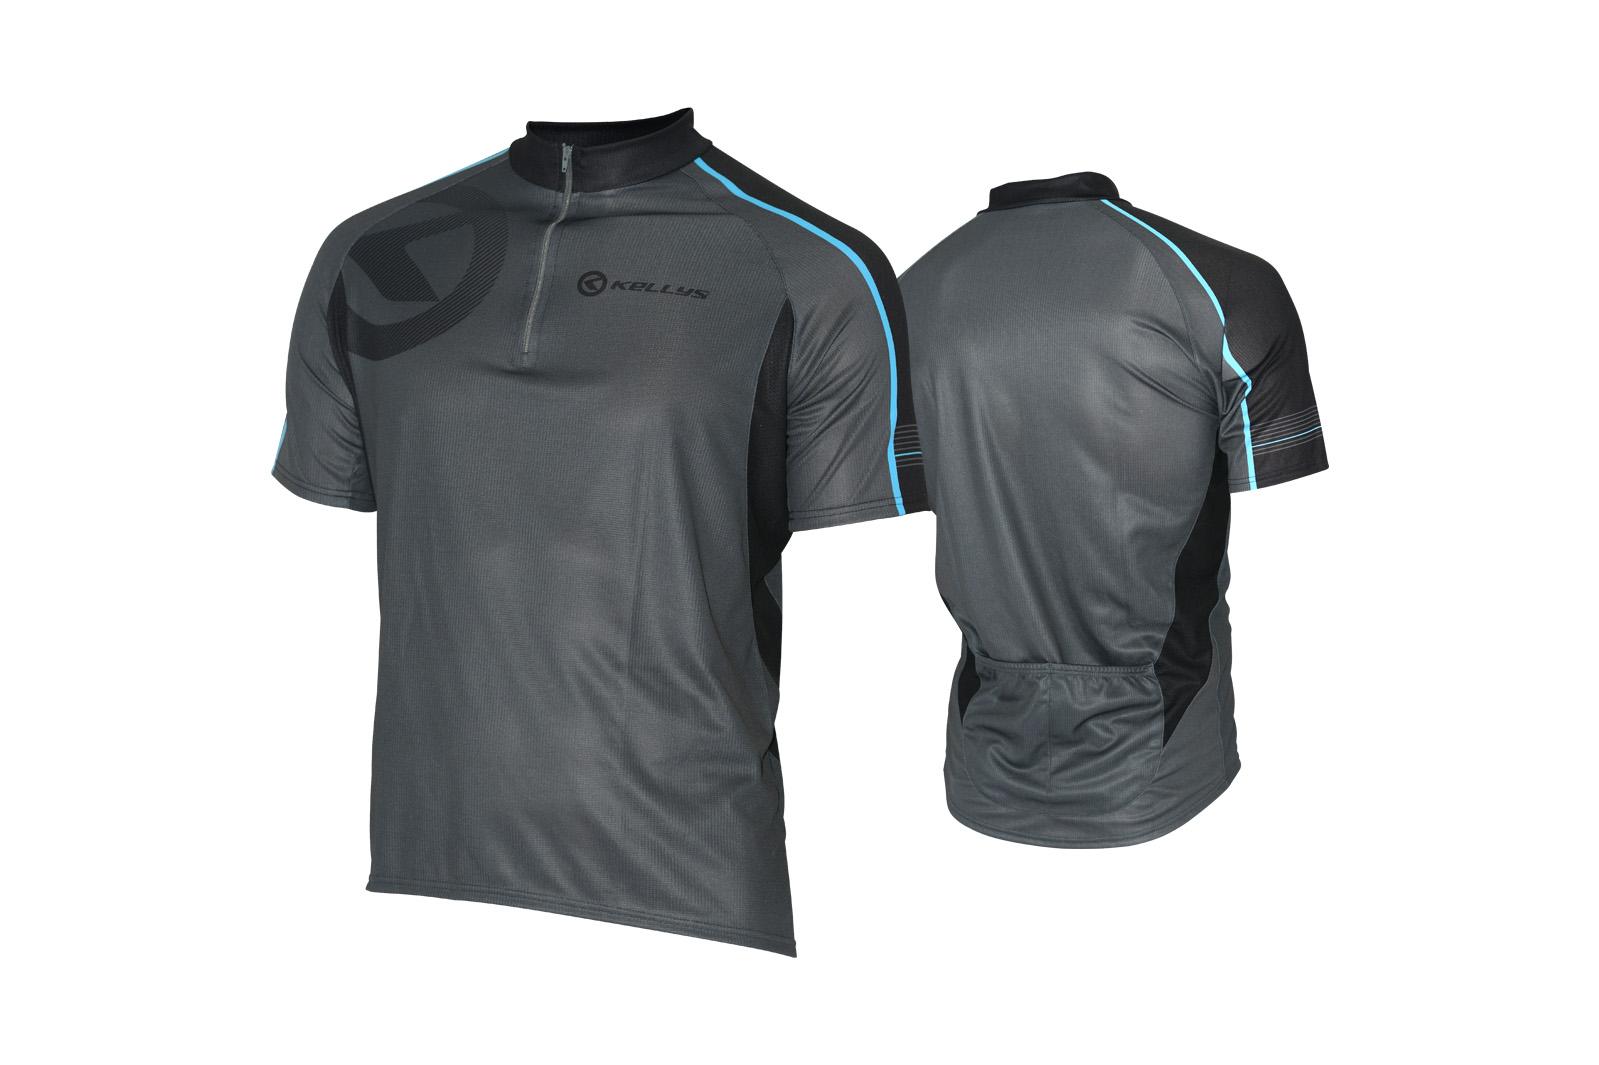 Pánský dres KELLYS PRO Sport, vel. M, šedo-modrá, krátký rukáv (Pánský cyklistický dres KELLYS, vel. M, krátký rukáv, barva šedá/modrá dle vyobrazení!)